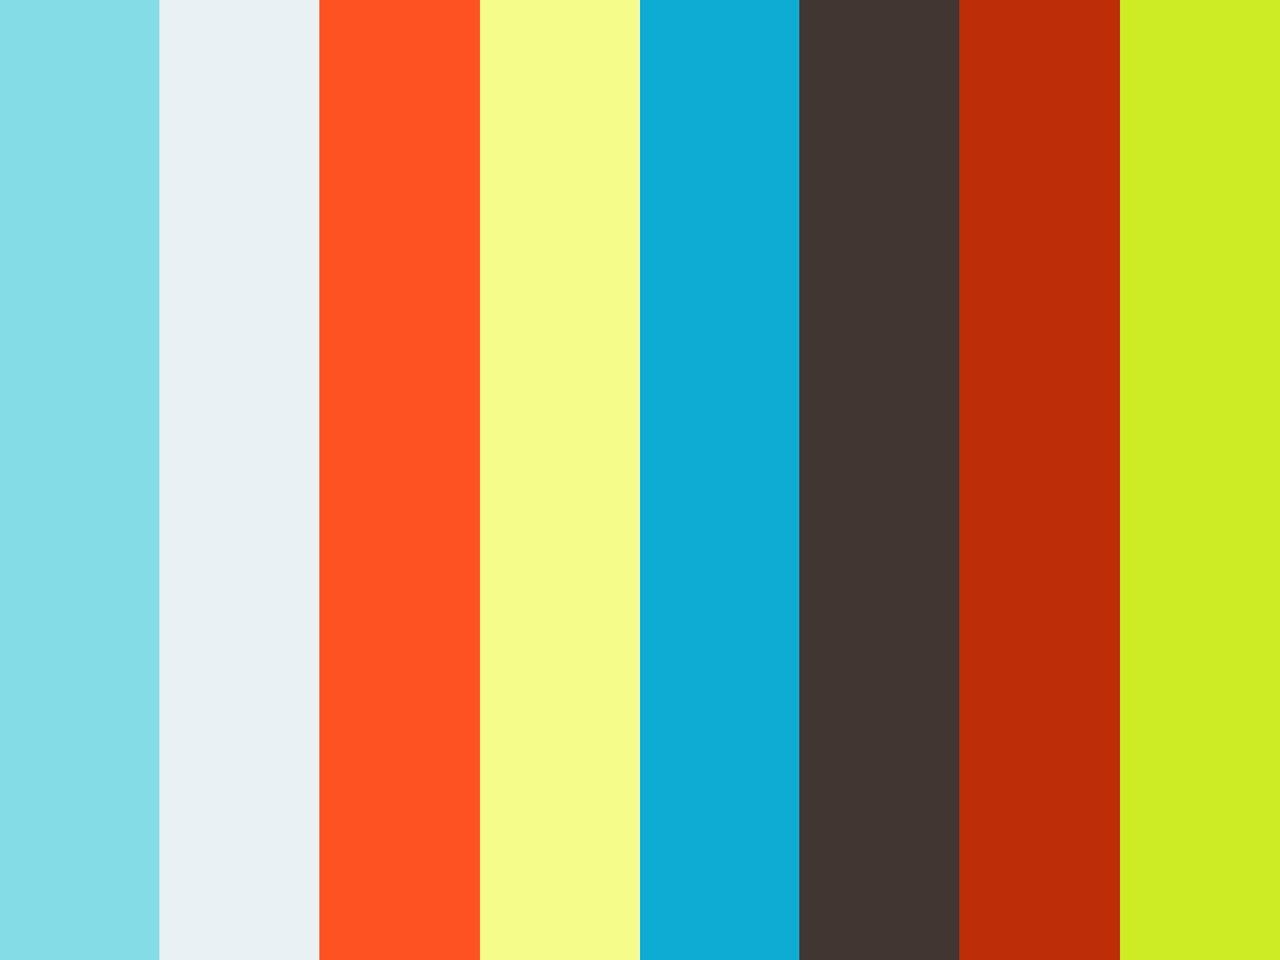 002735 - CORP - Ohlala BehaKlas - Tip 11 - Plakbeha